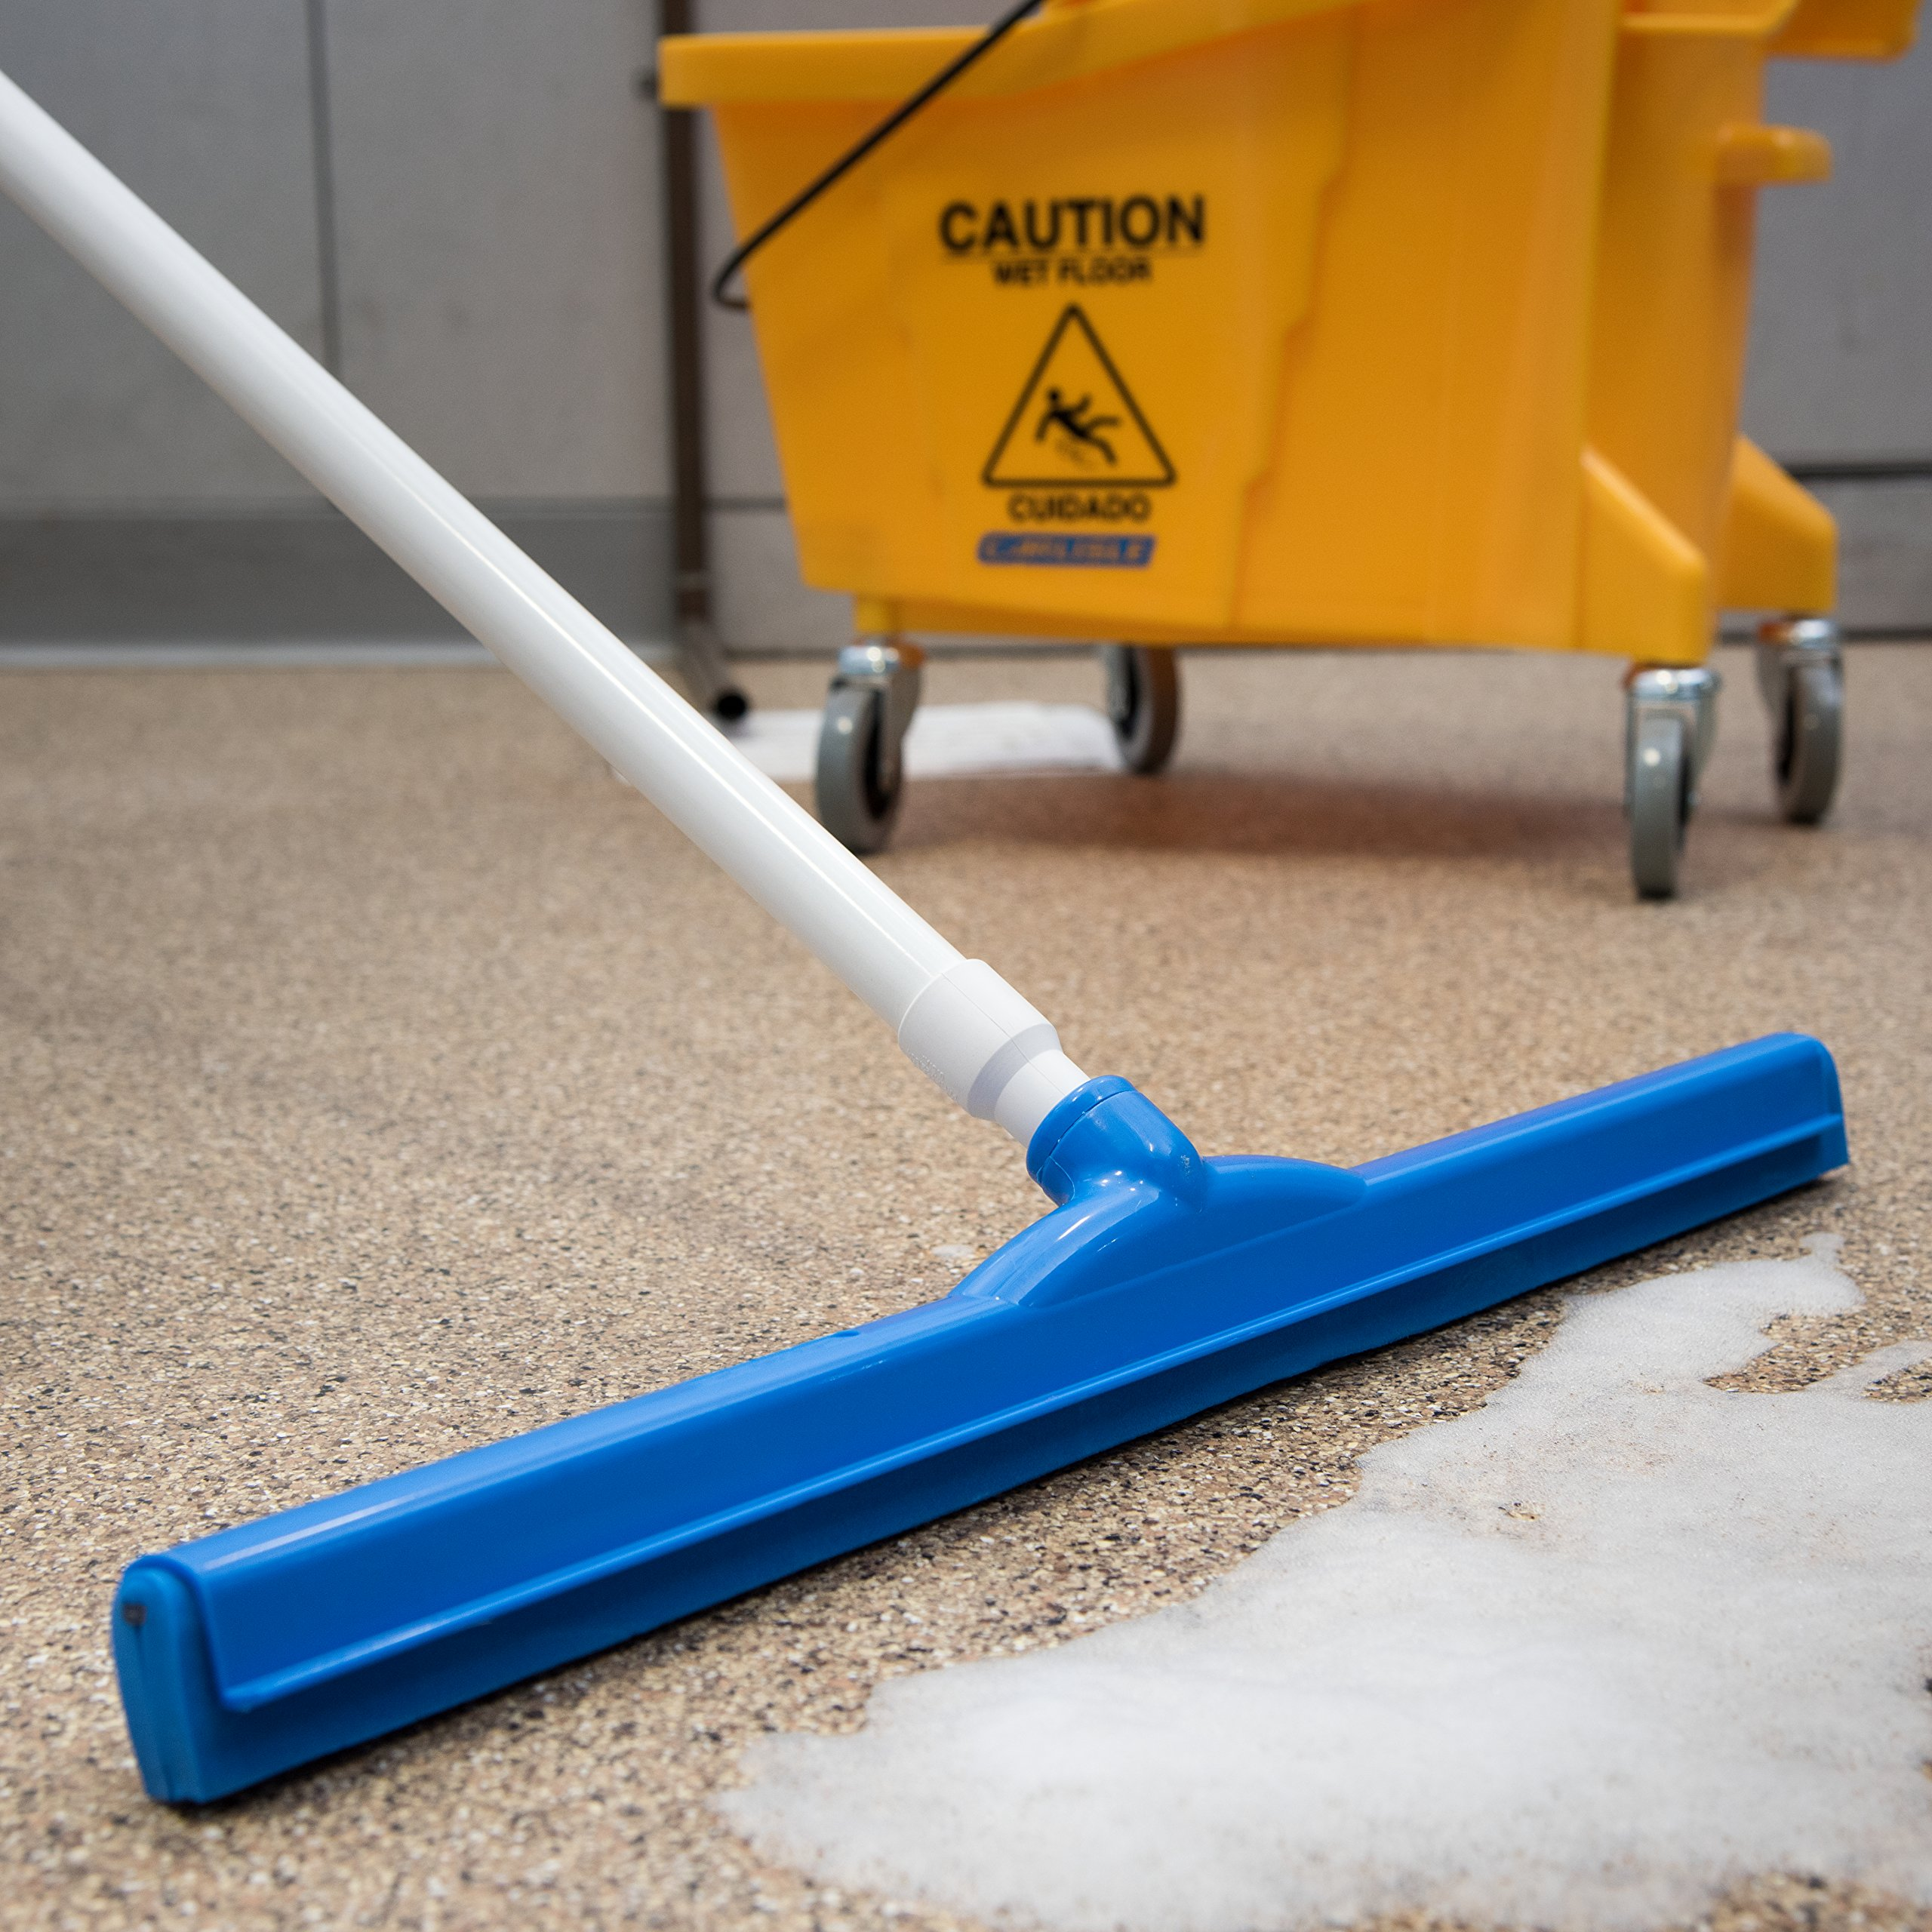 Carlisle 4156814 Spectrum Double Foam Rubber Hygienic Floor Squeegee, 24'' Width, Blue (Case of 6) by Carlisle (Image #6)